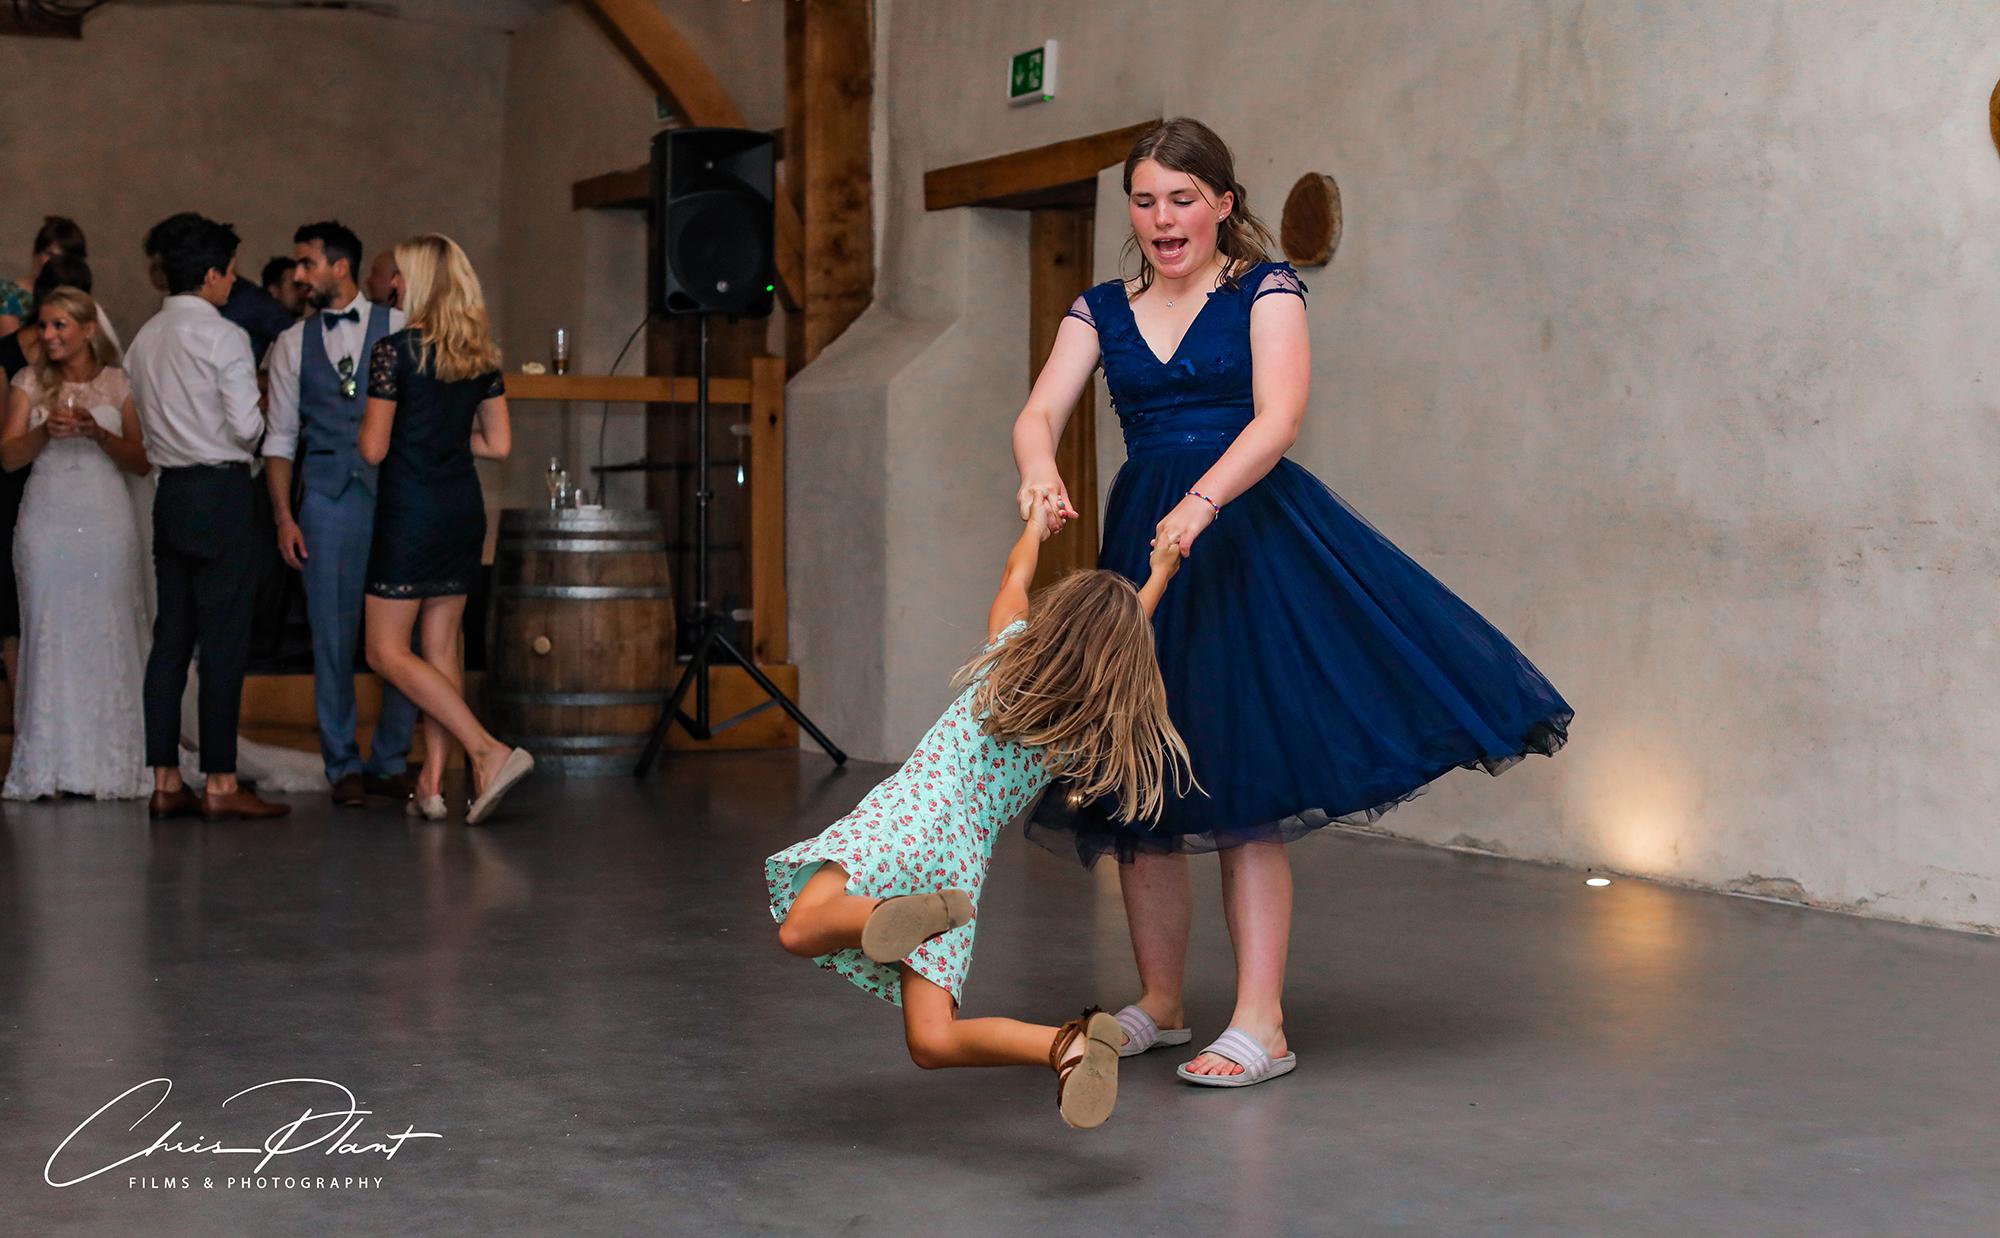 Young girls swing round dancing on the dancefloor